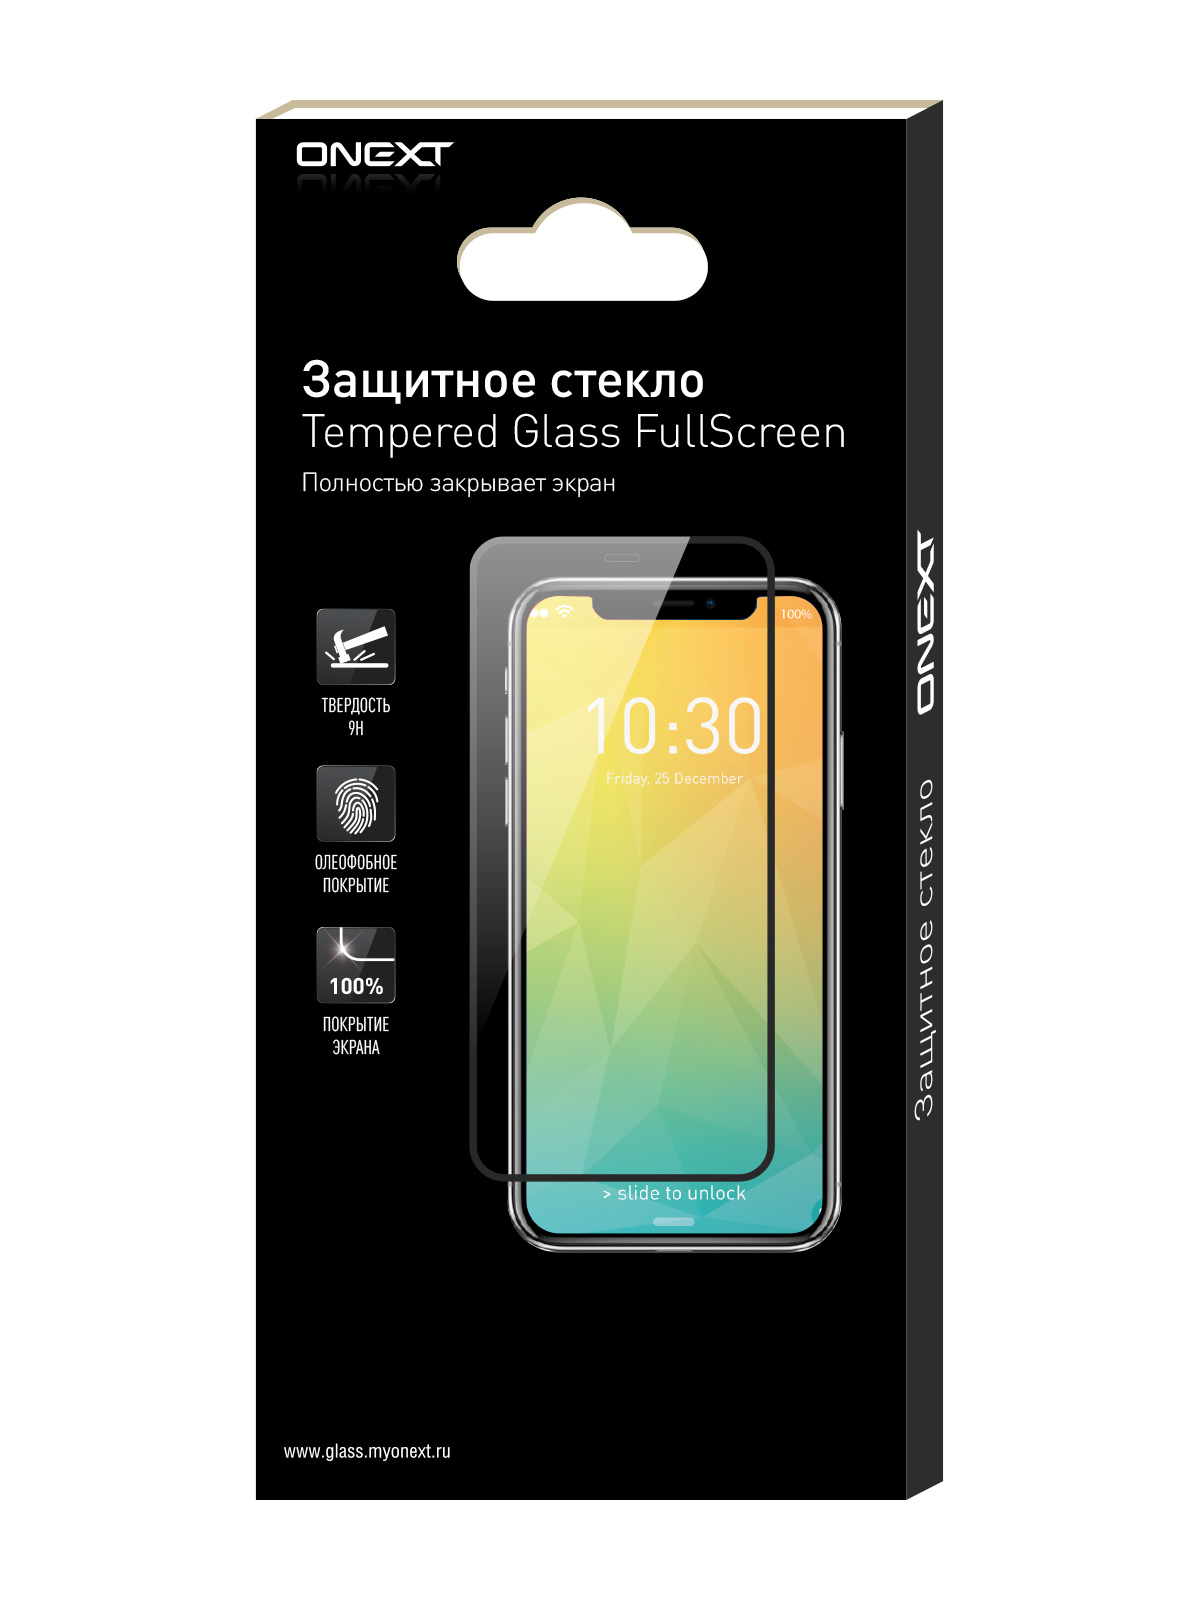 Защитное стекло ONEXT для Samsung Galaxy A5 (2016) White